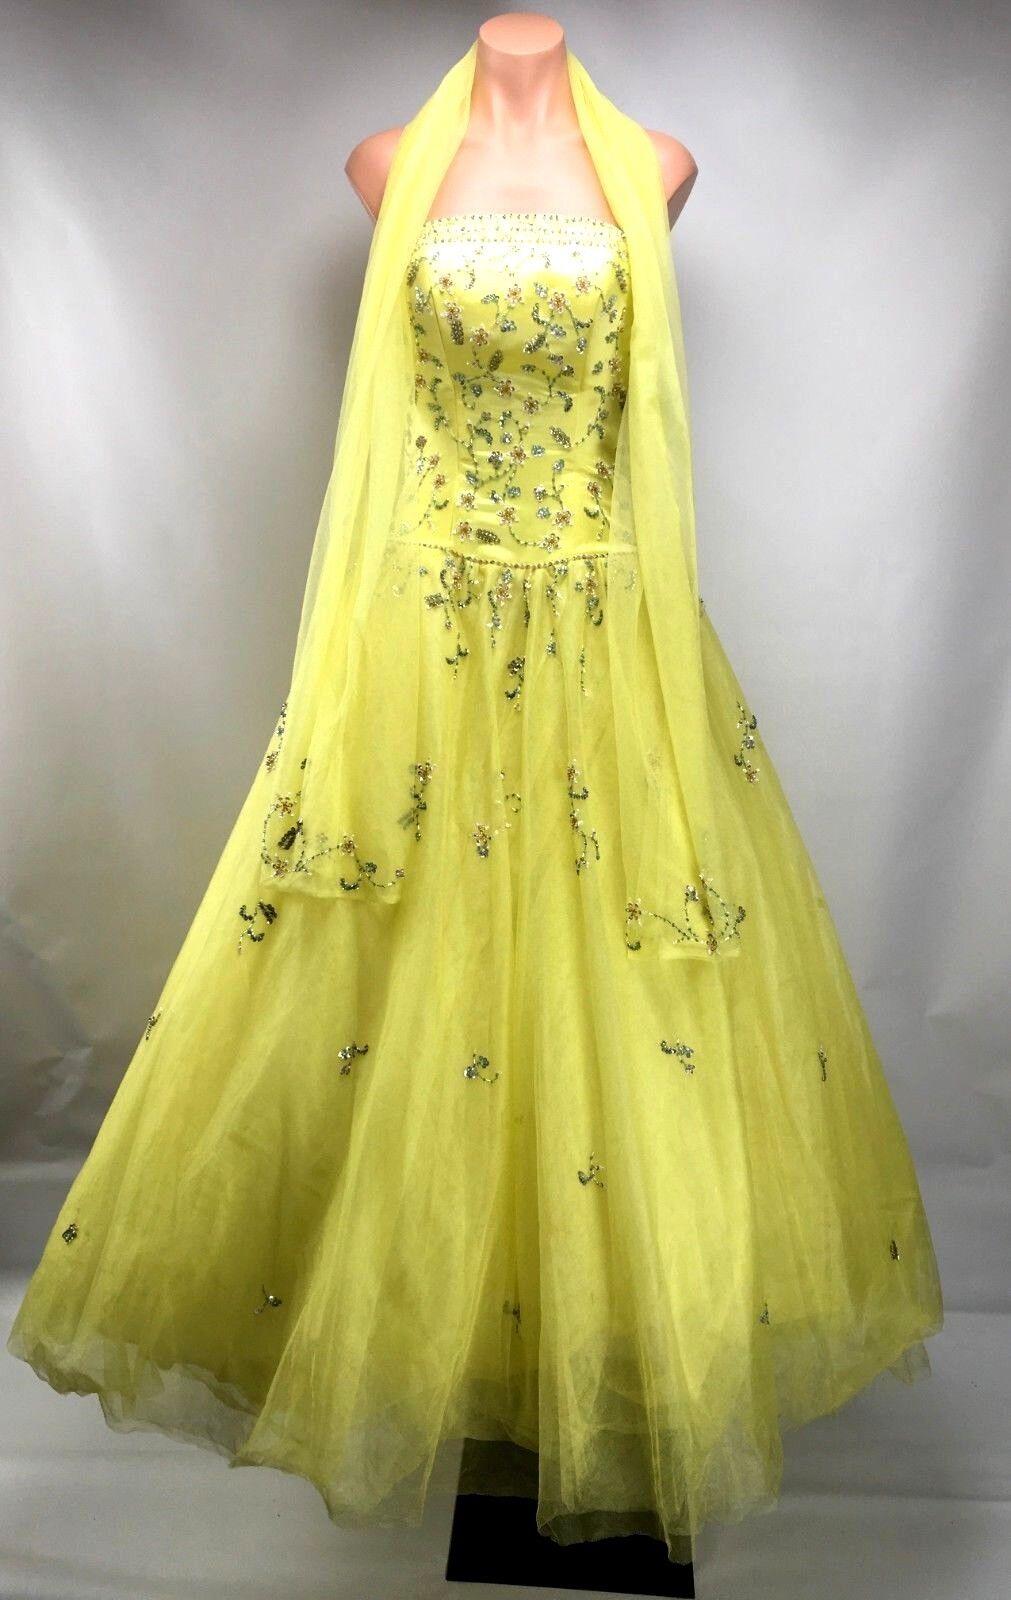 Jaune Tulle Sequin Beaded Robe de bal Prom Sweet 16 Robe Alyce Designs Sz 4